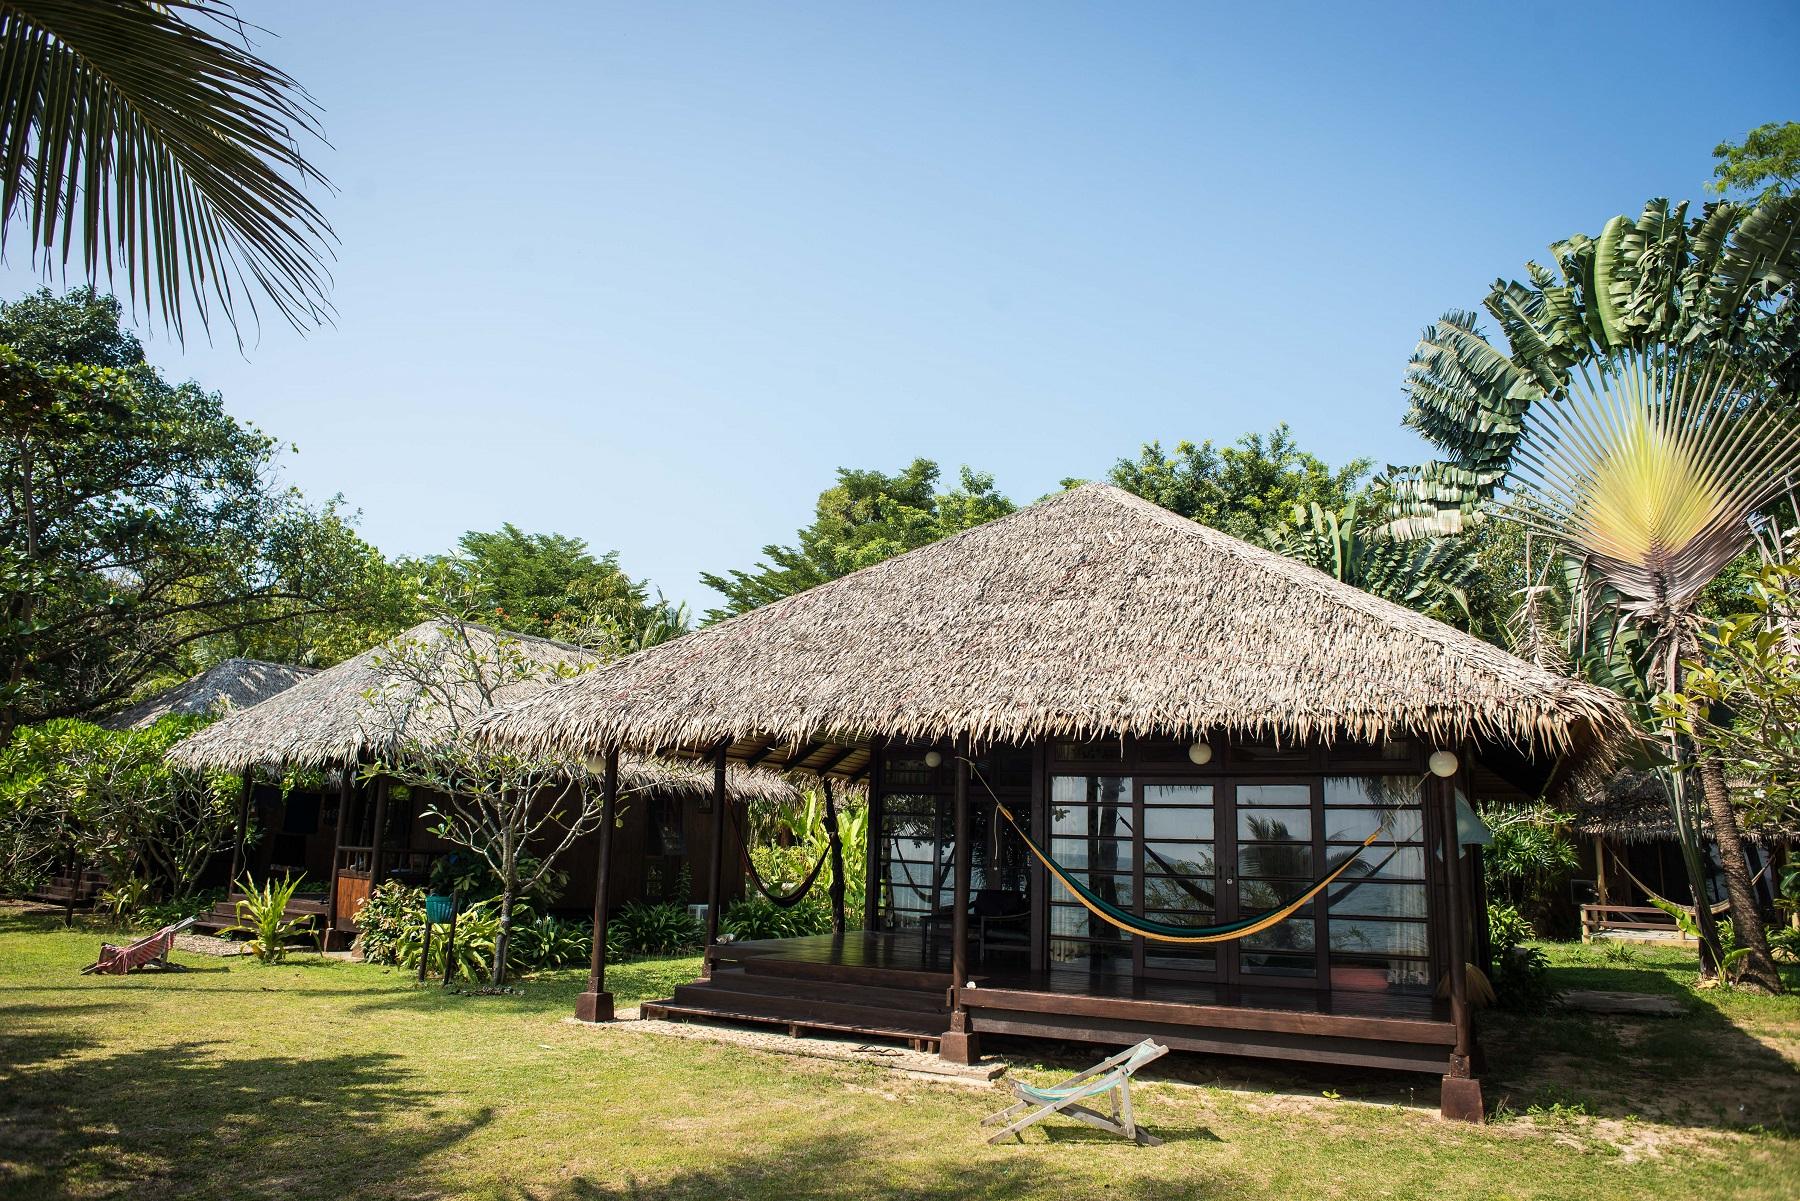 Monkey-island-resort-koh-mak